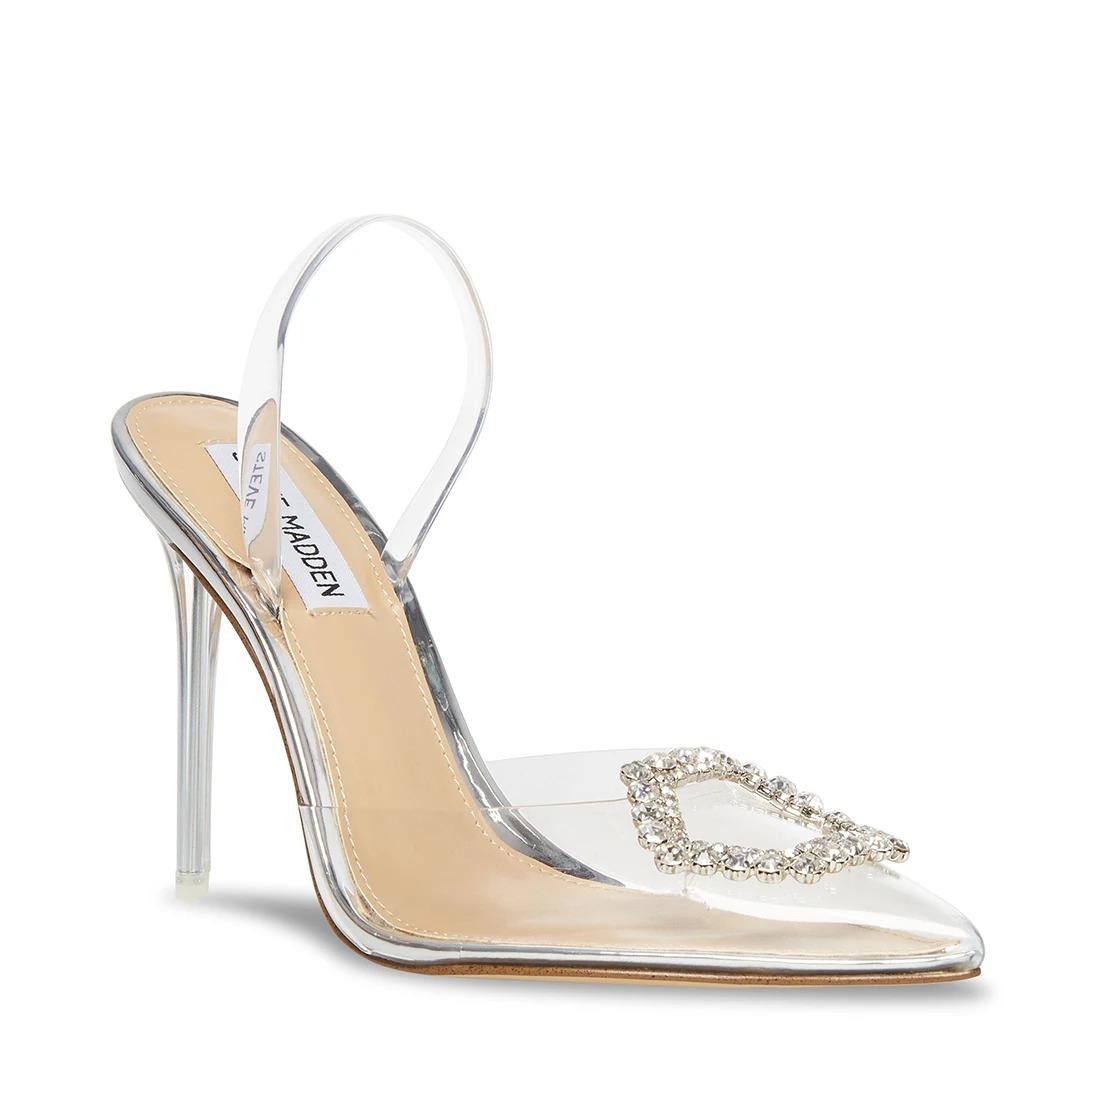 embellished clear pointed toe Steve Madden wedding heels